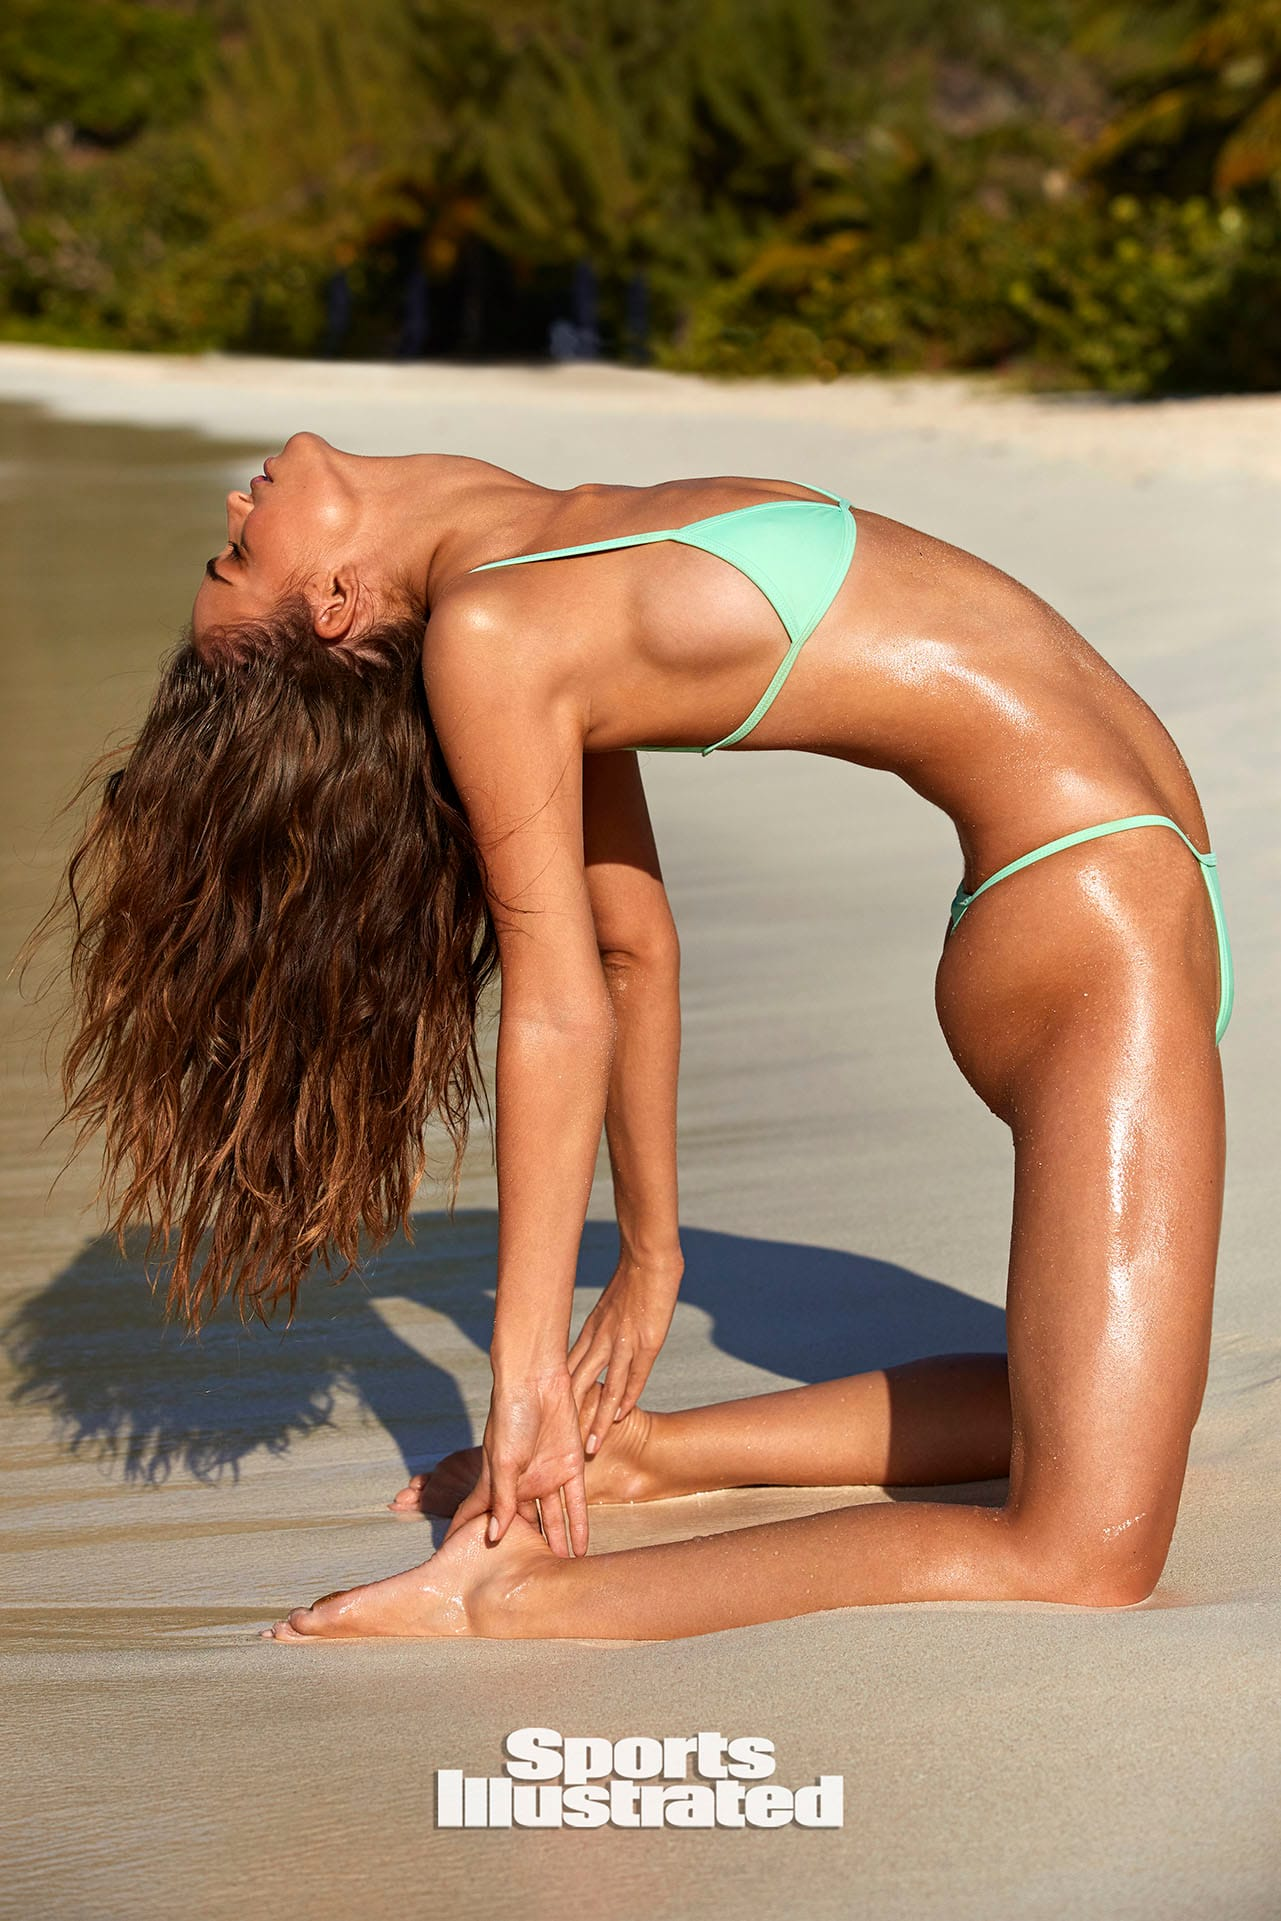 Робин Хольцкен в каталоге купальников Sports Illustrated Swimsuit 2020 / фото 17